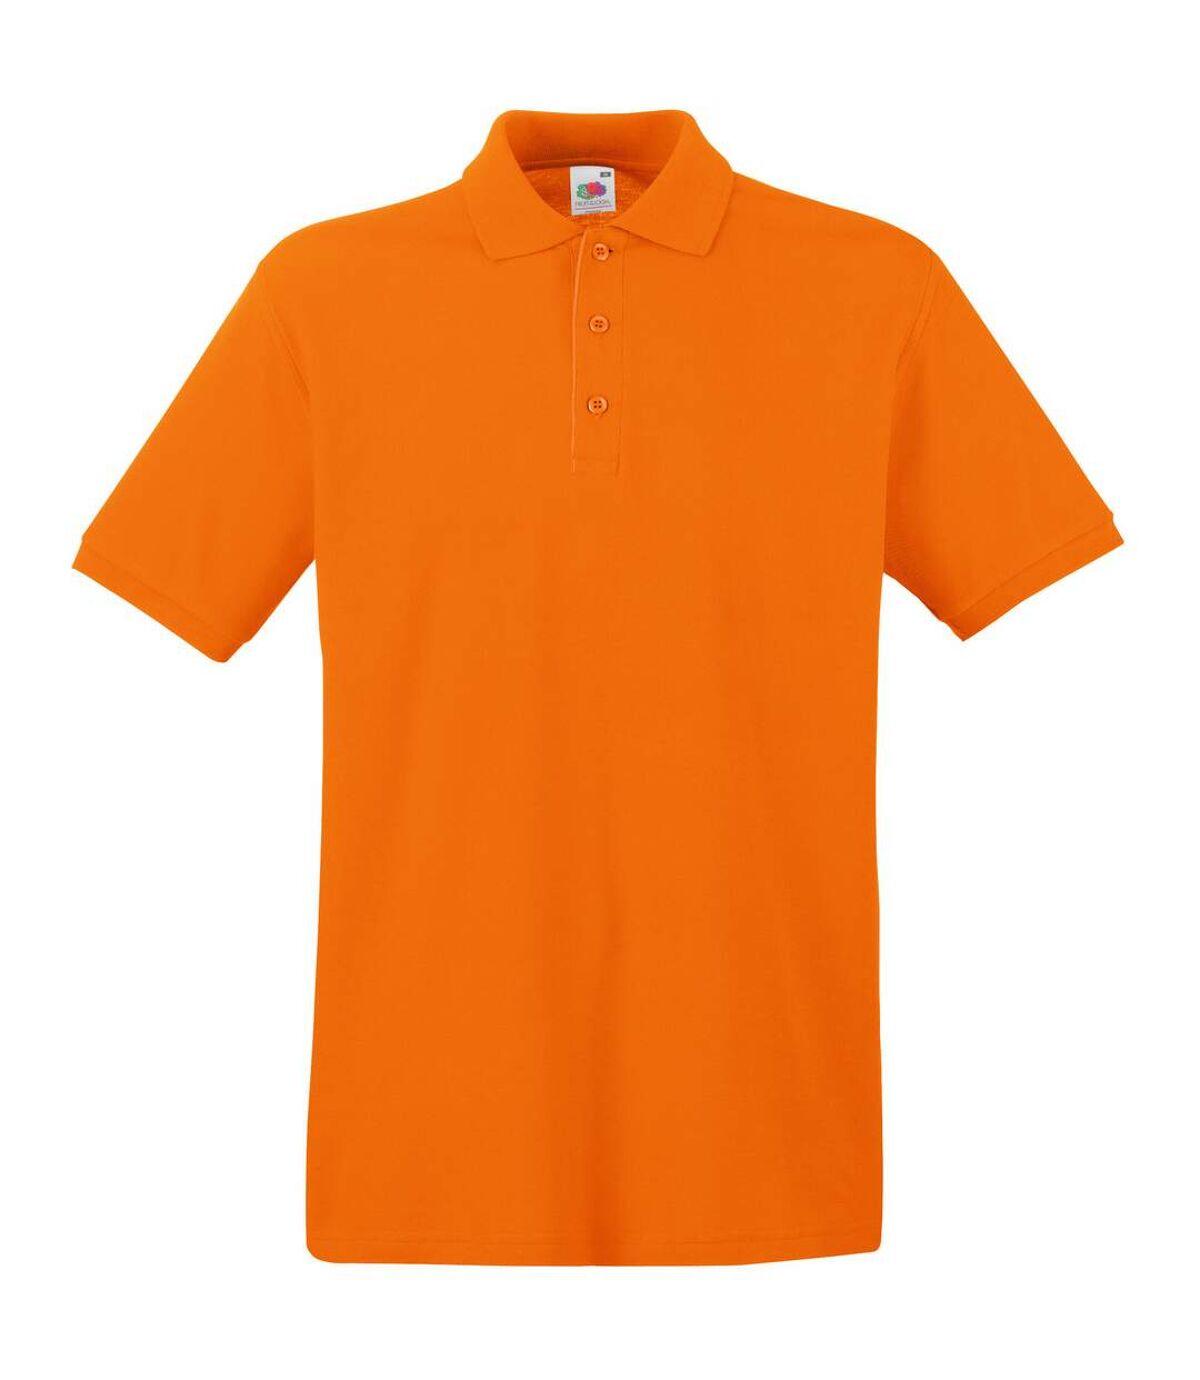 Fruit Of The Loom Premium Mens Short Sleeve Polo Shirt (Kelly Green) - UTBC1381